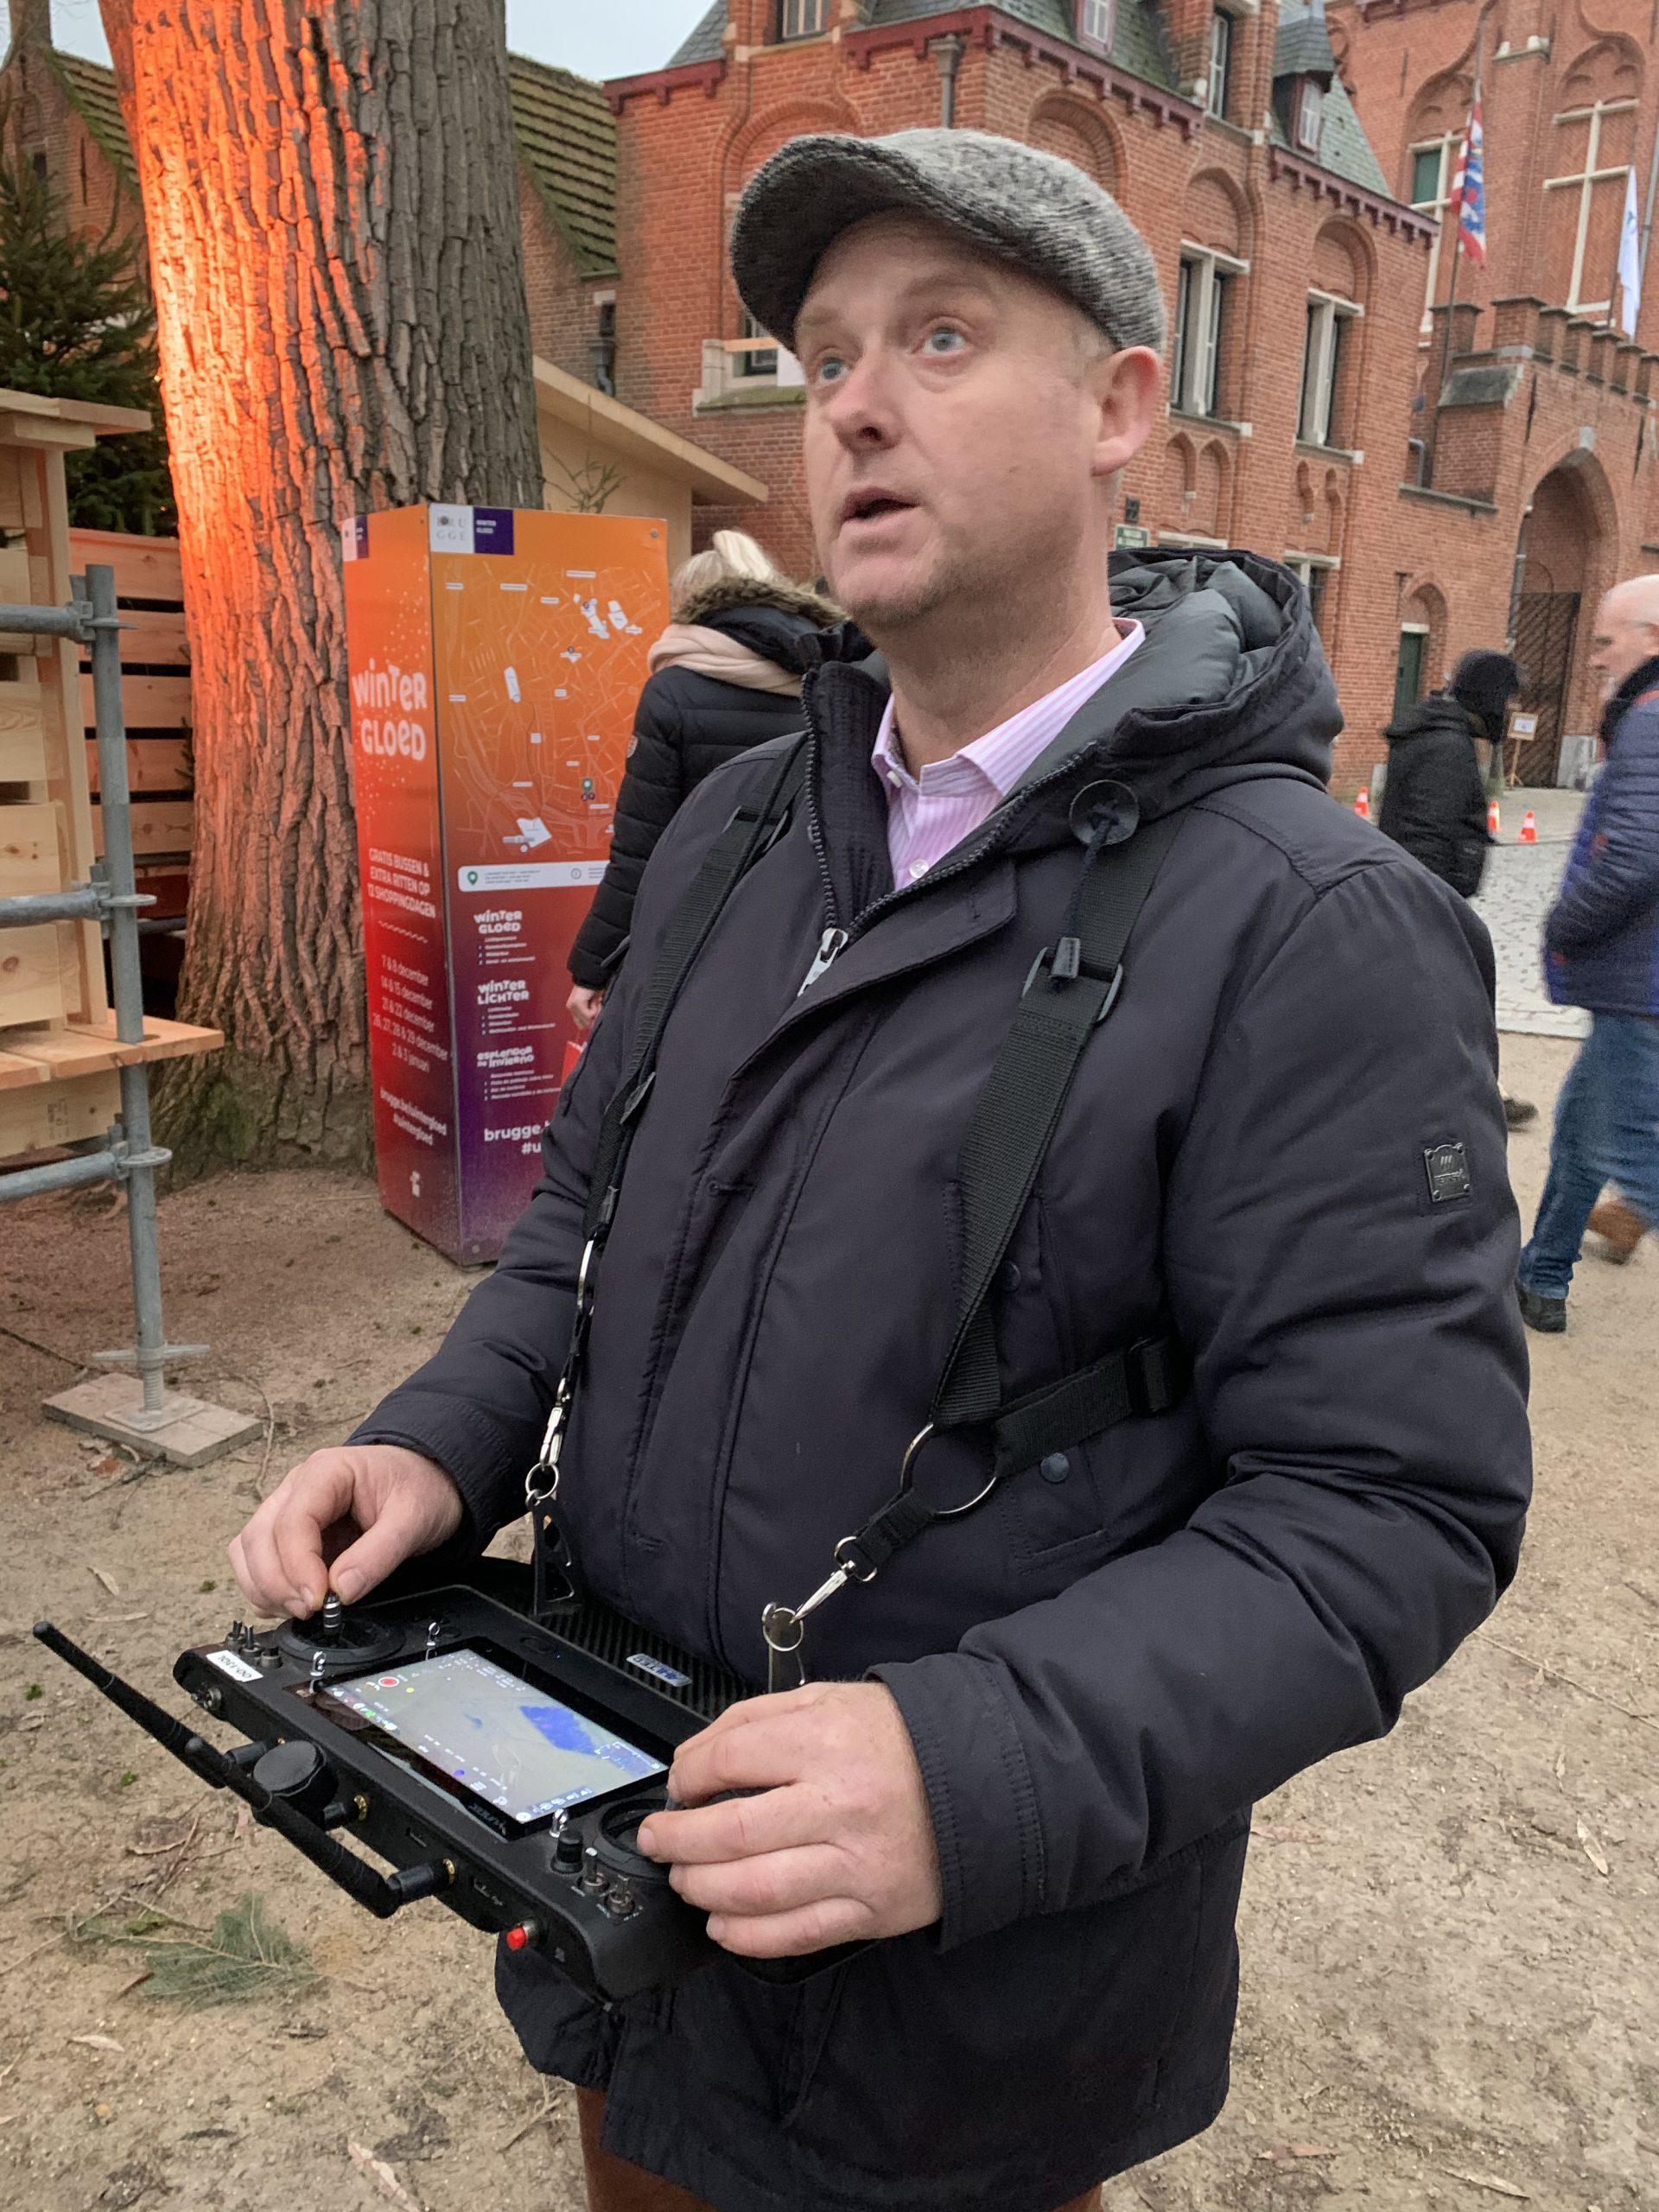 glice-brugge-drone-opname-matthias-vandendriessche-1